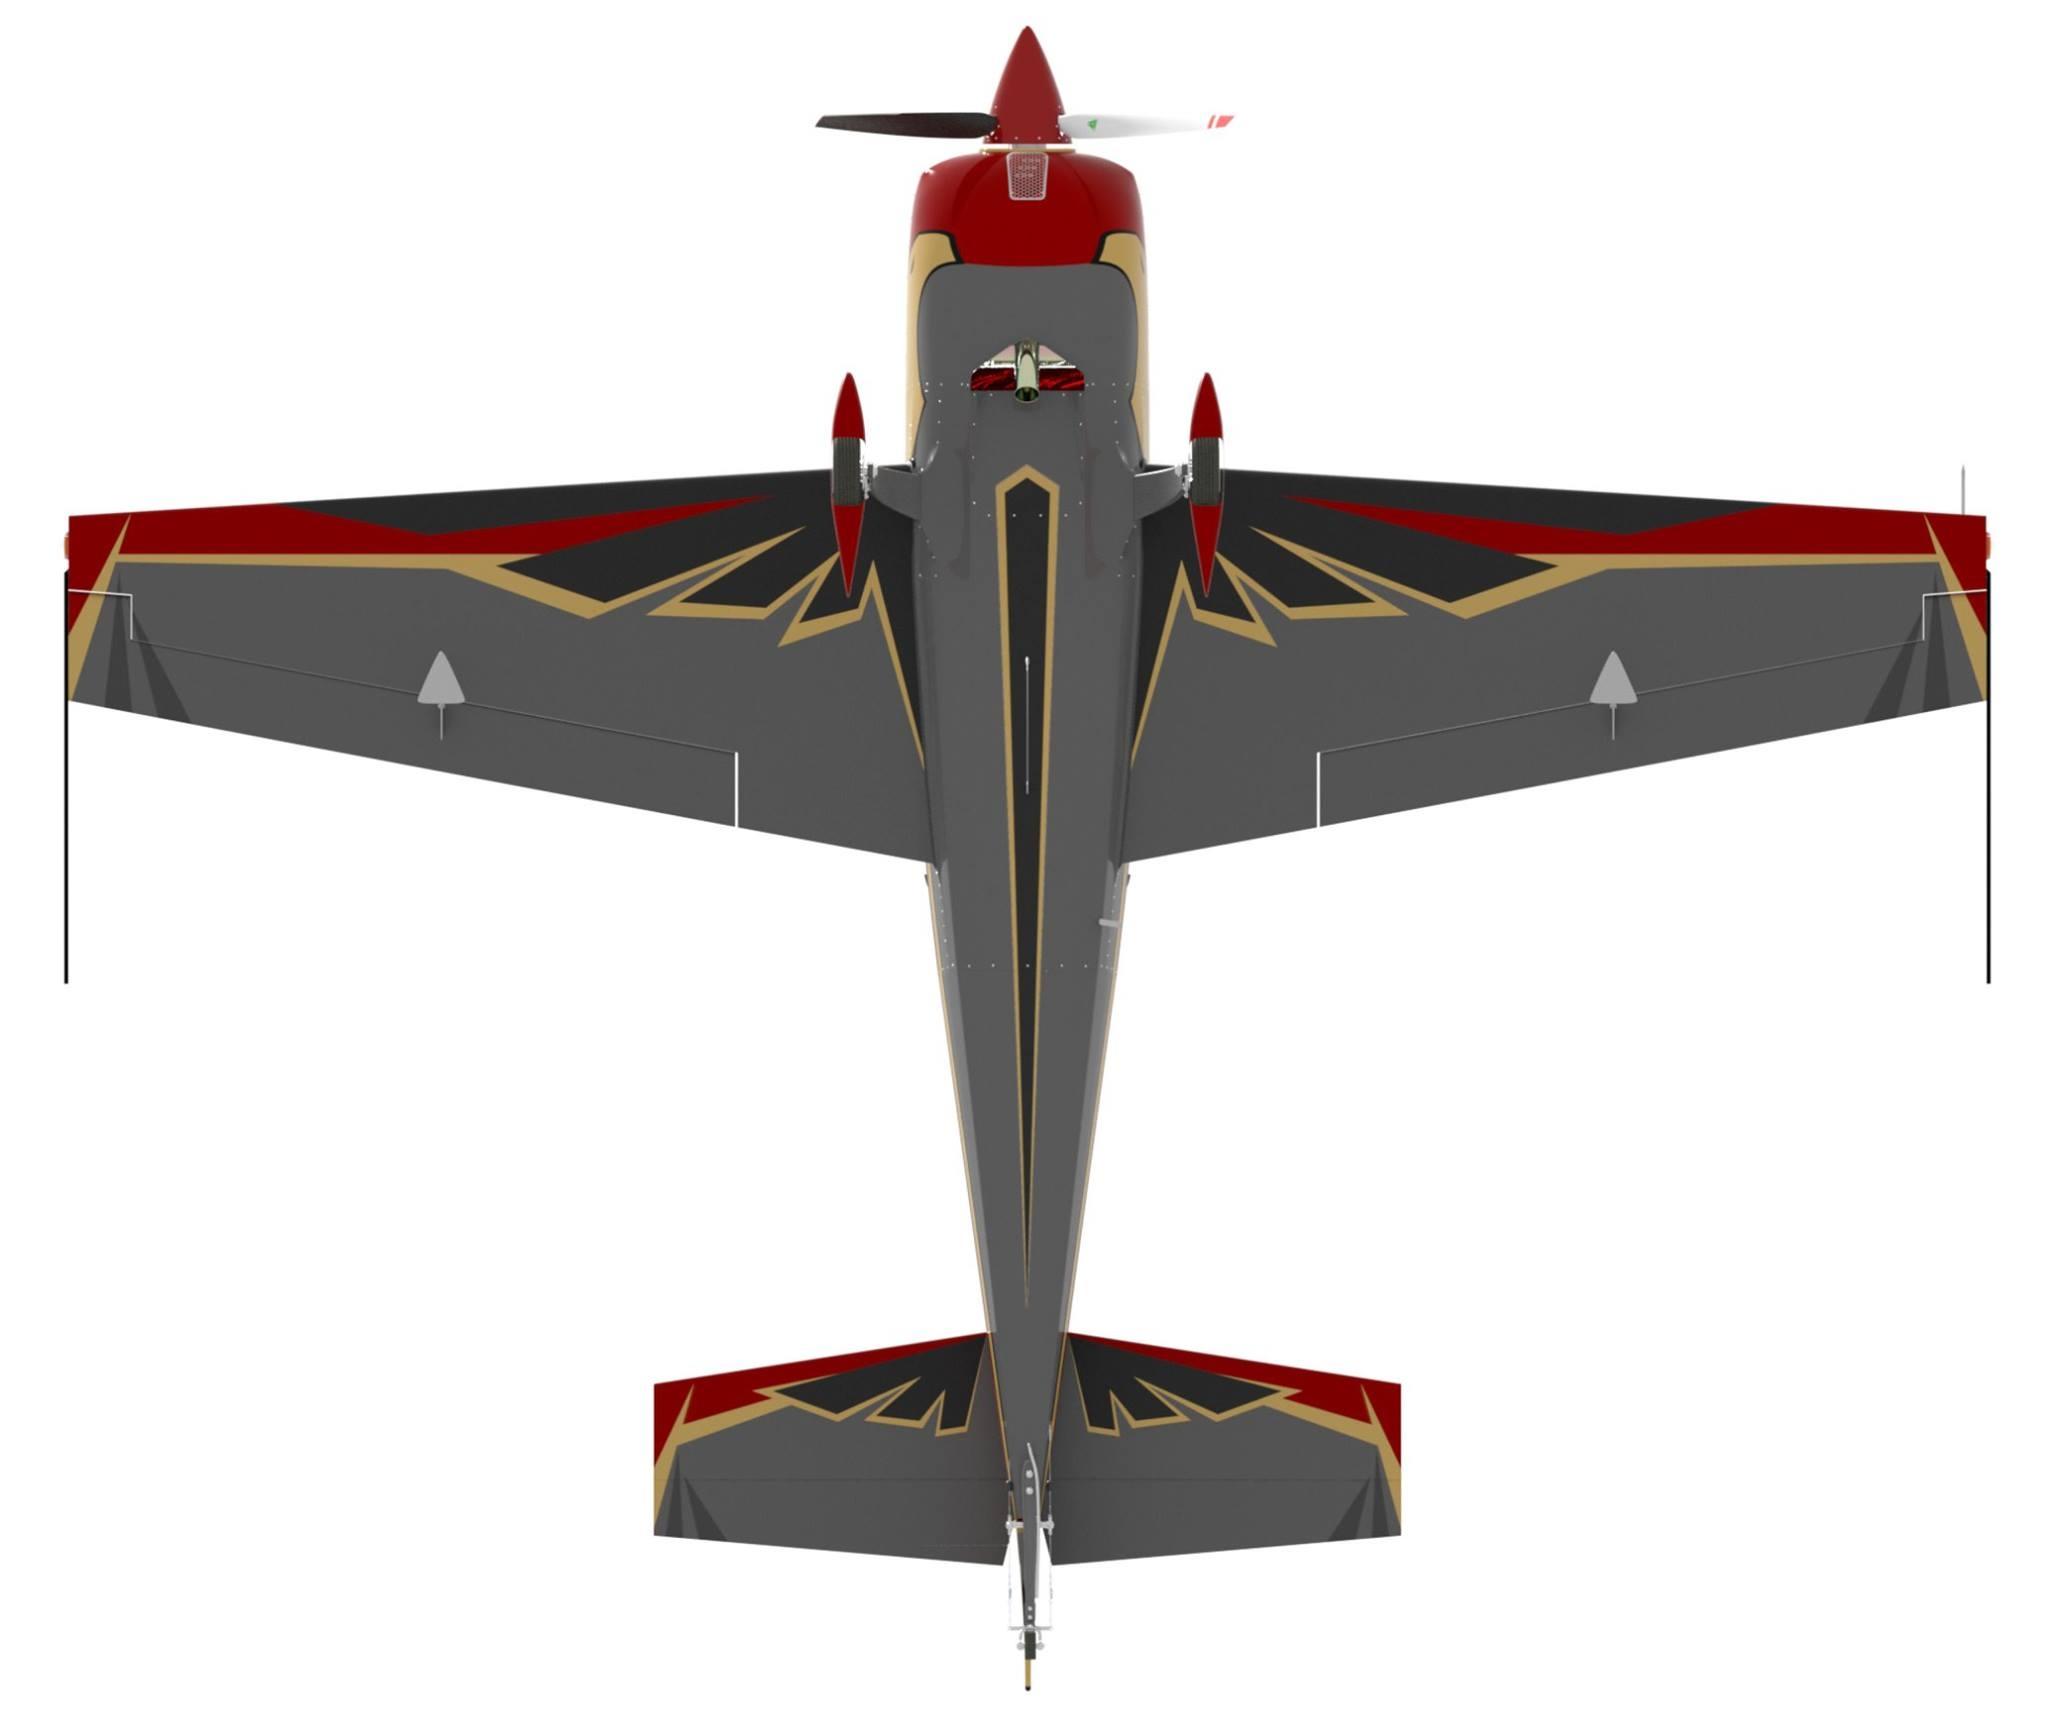 Royal Jordanian Falcons Extra 330LX color scheme. Photo teams facebook page